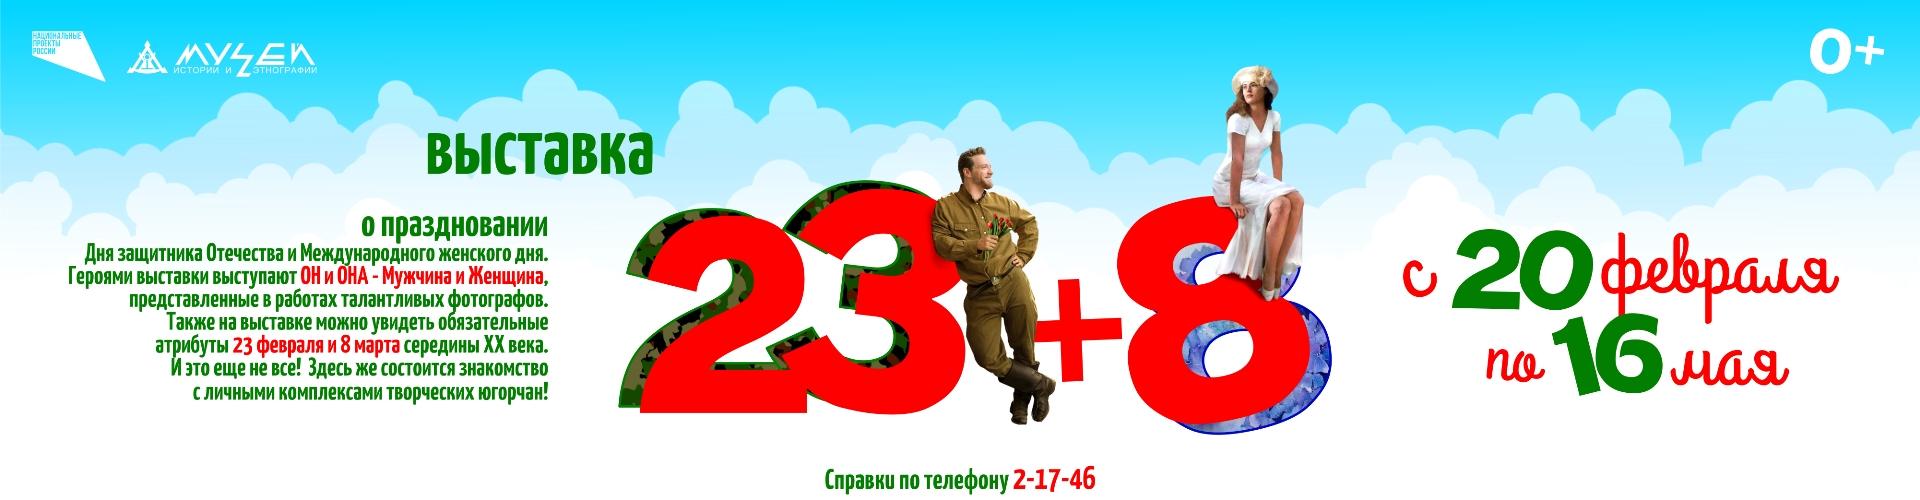 vistavka238